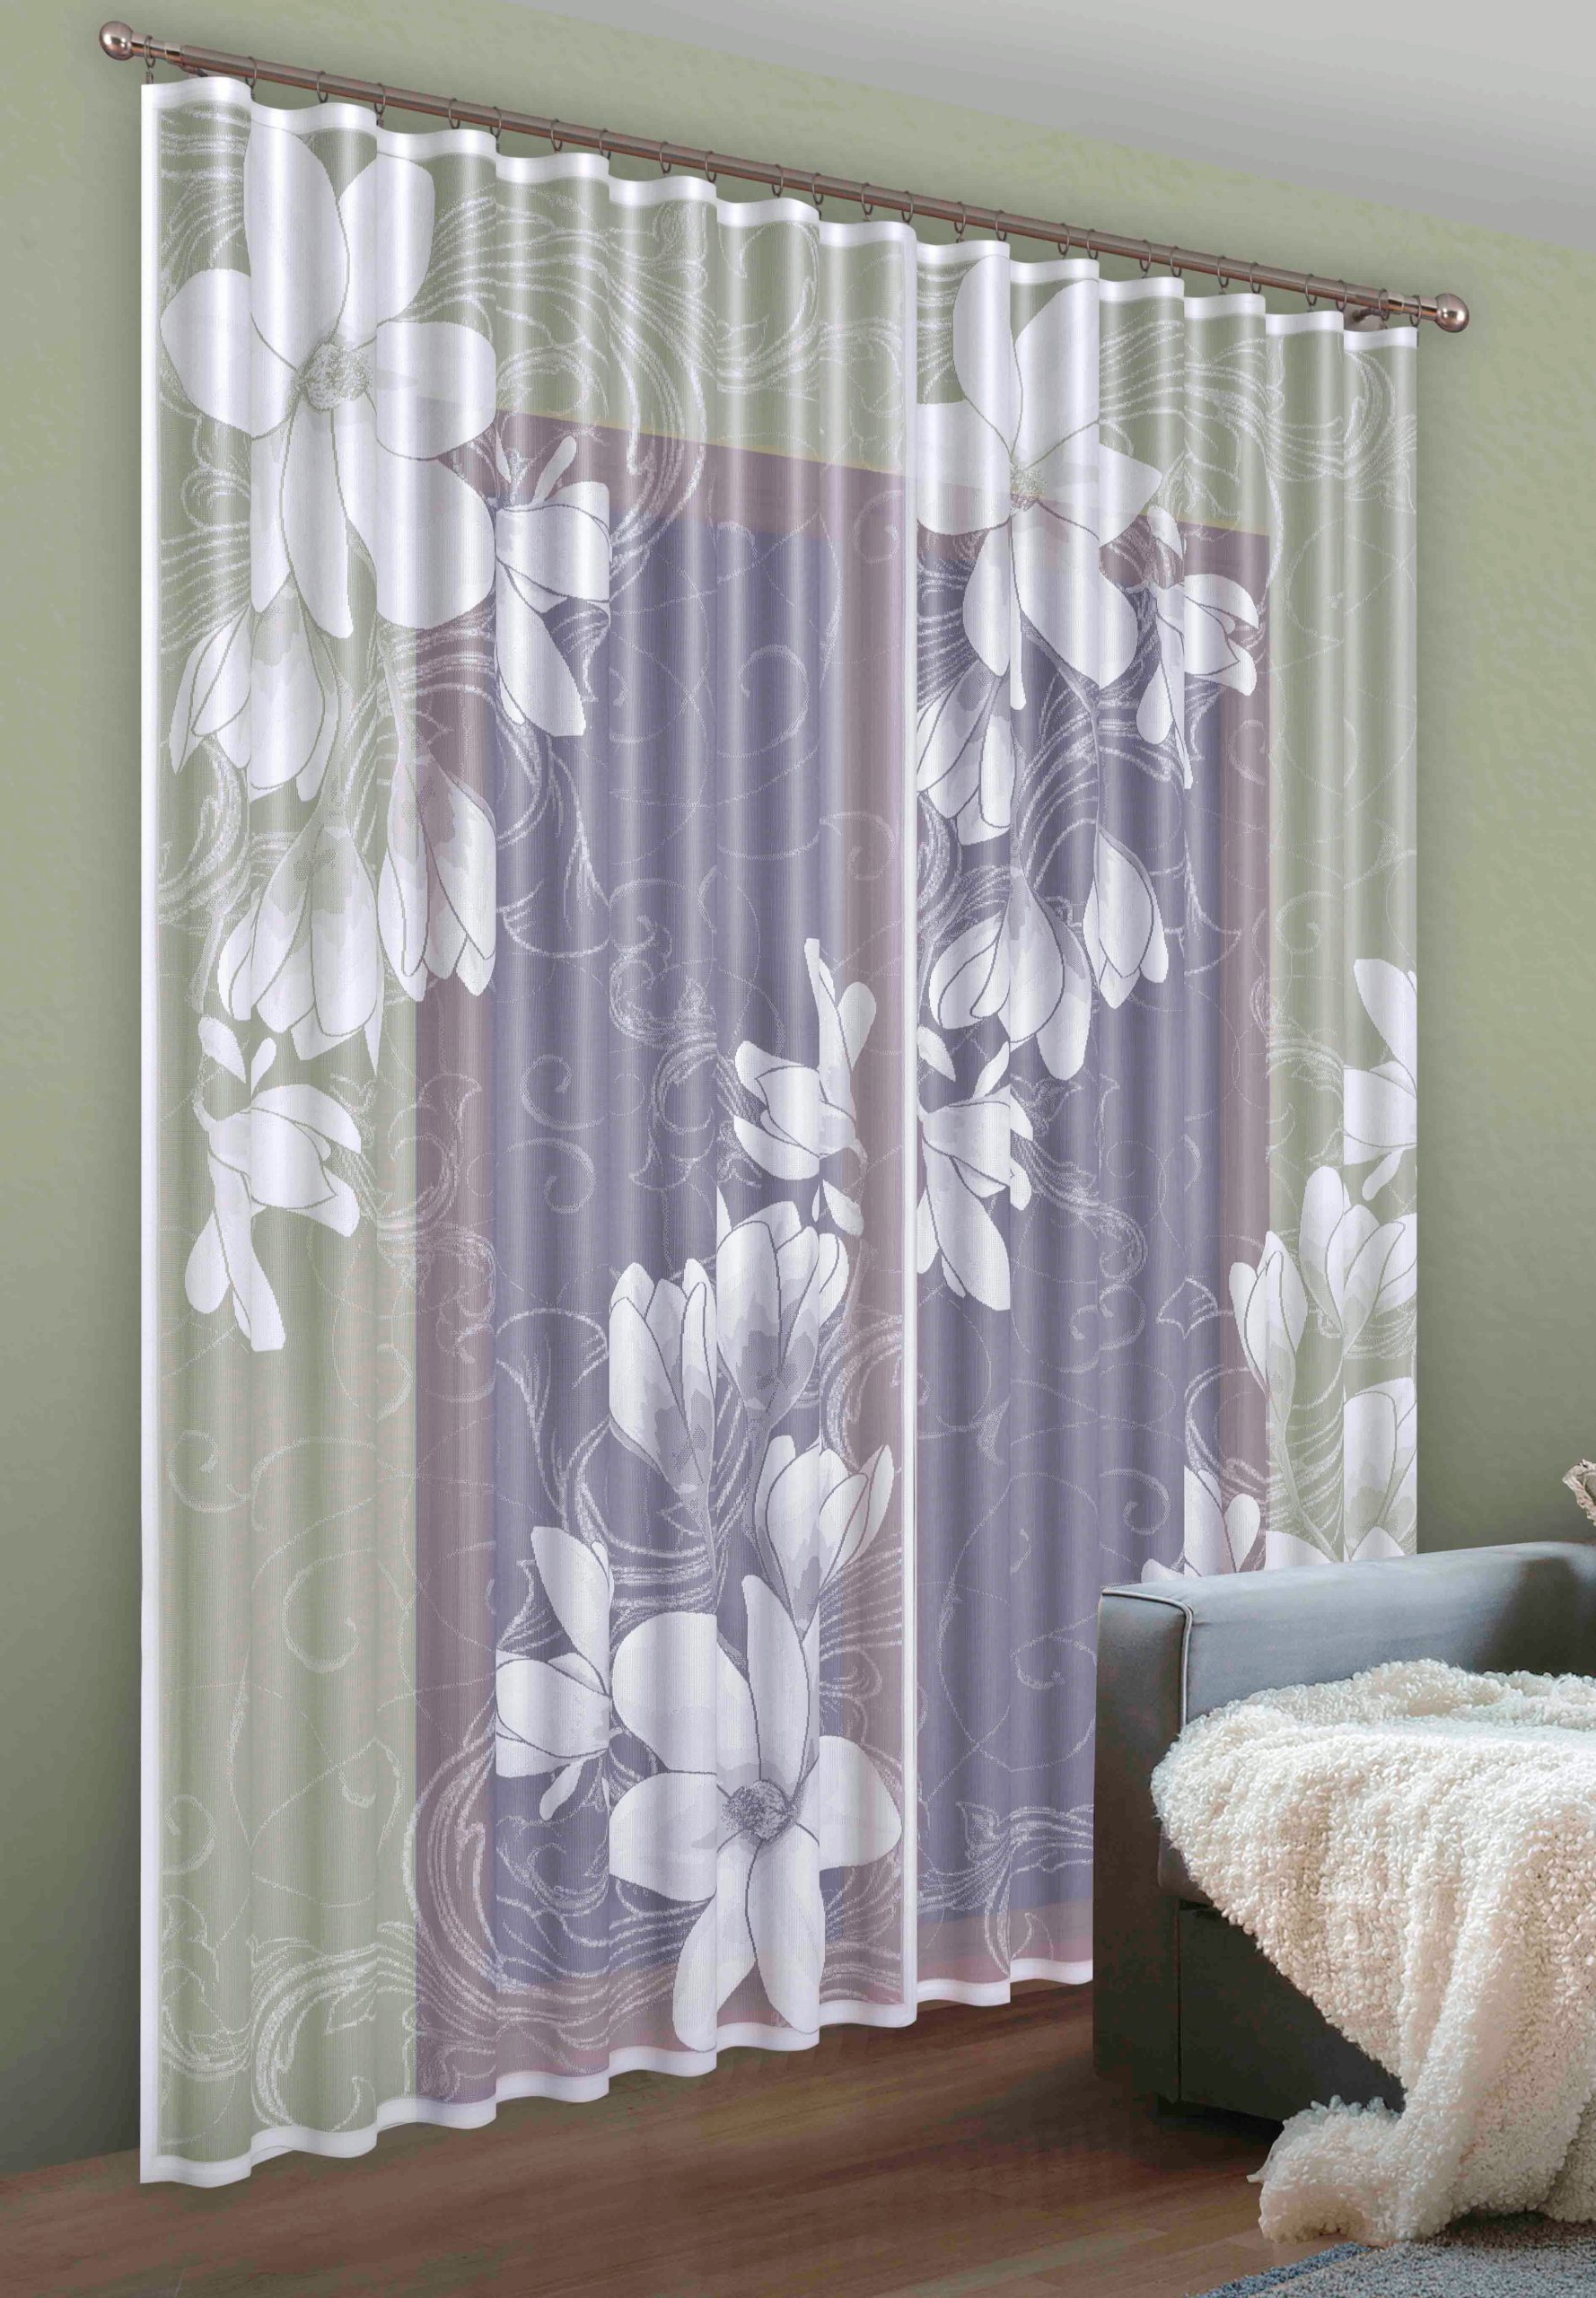 Firanki Magnolia Firanka Firany Kwiat Iwg272 Wisan